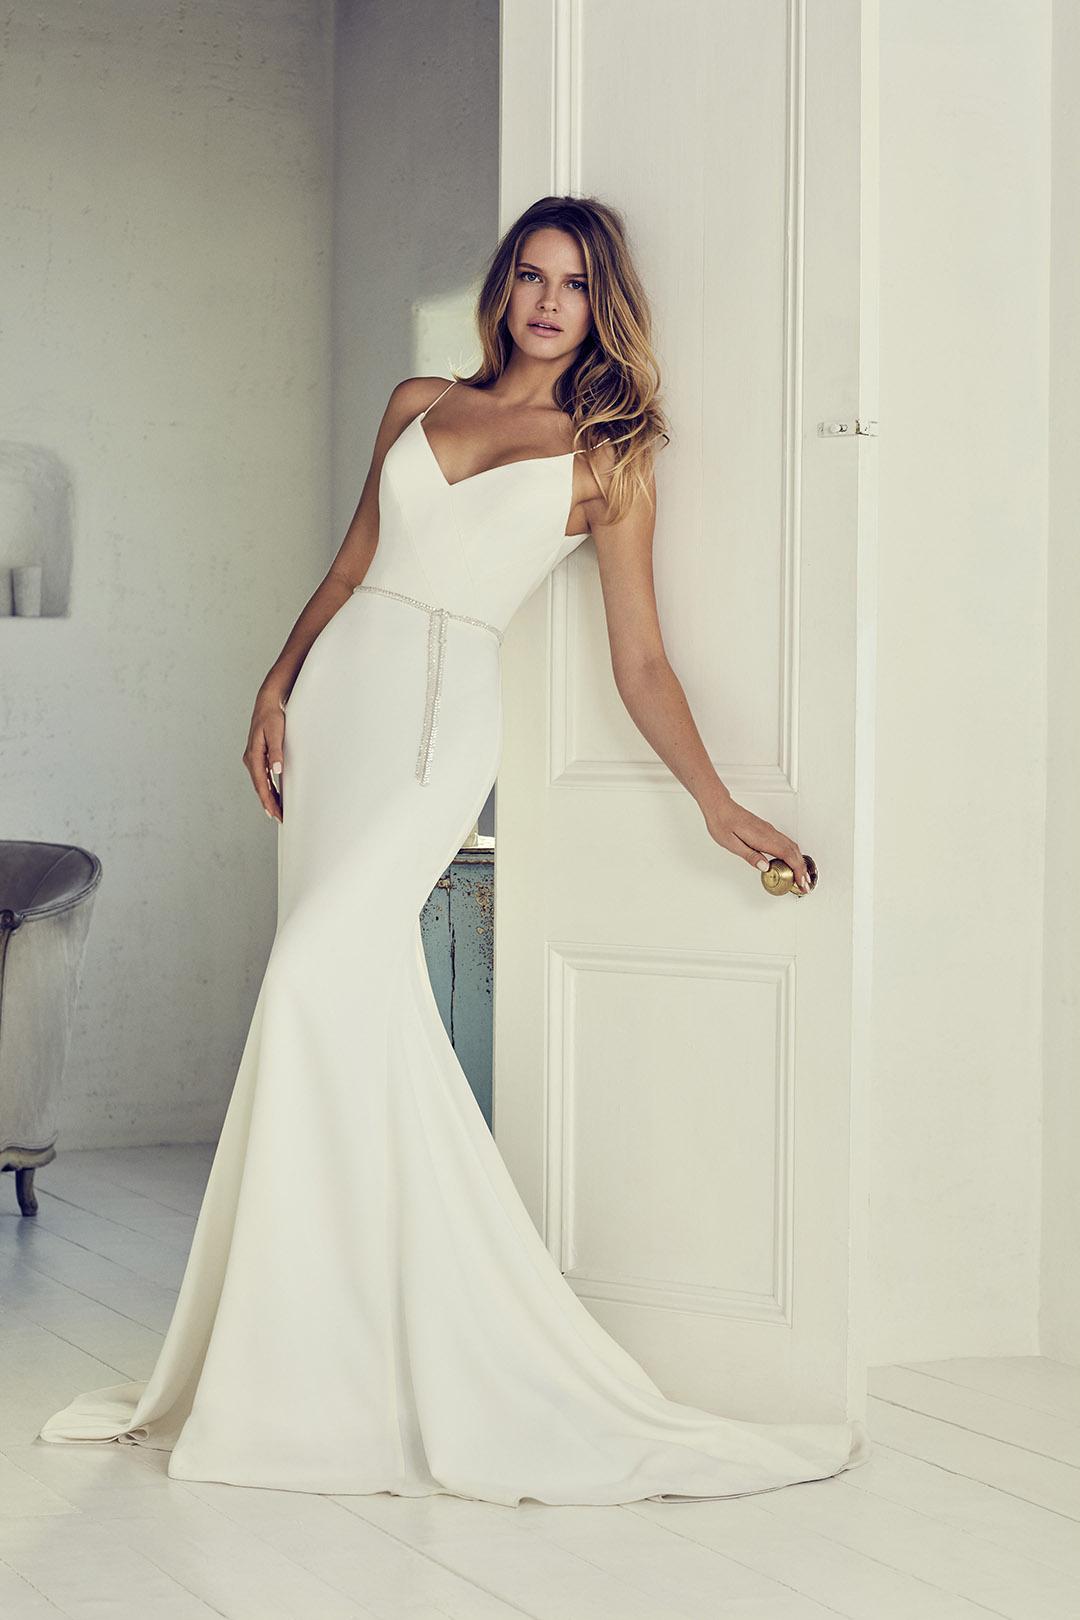 venus-wedding-dresses-uk-suzanne-neville-collection-hd-2019